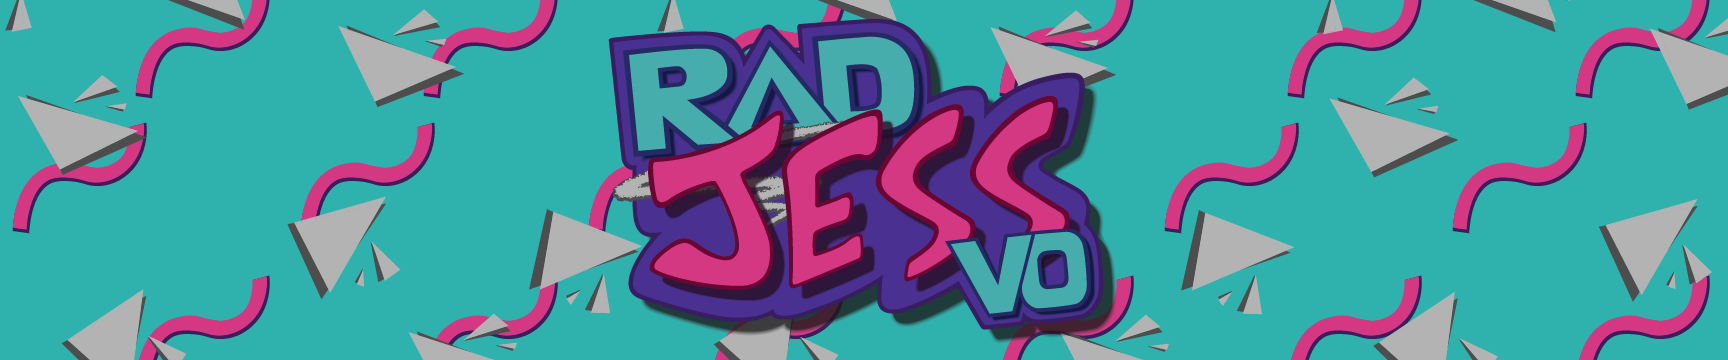 RadJess VO Banner